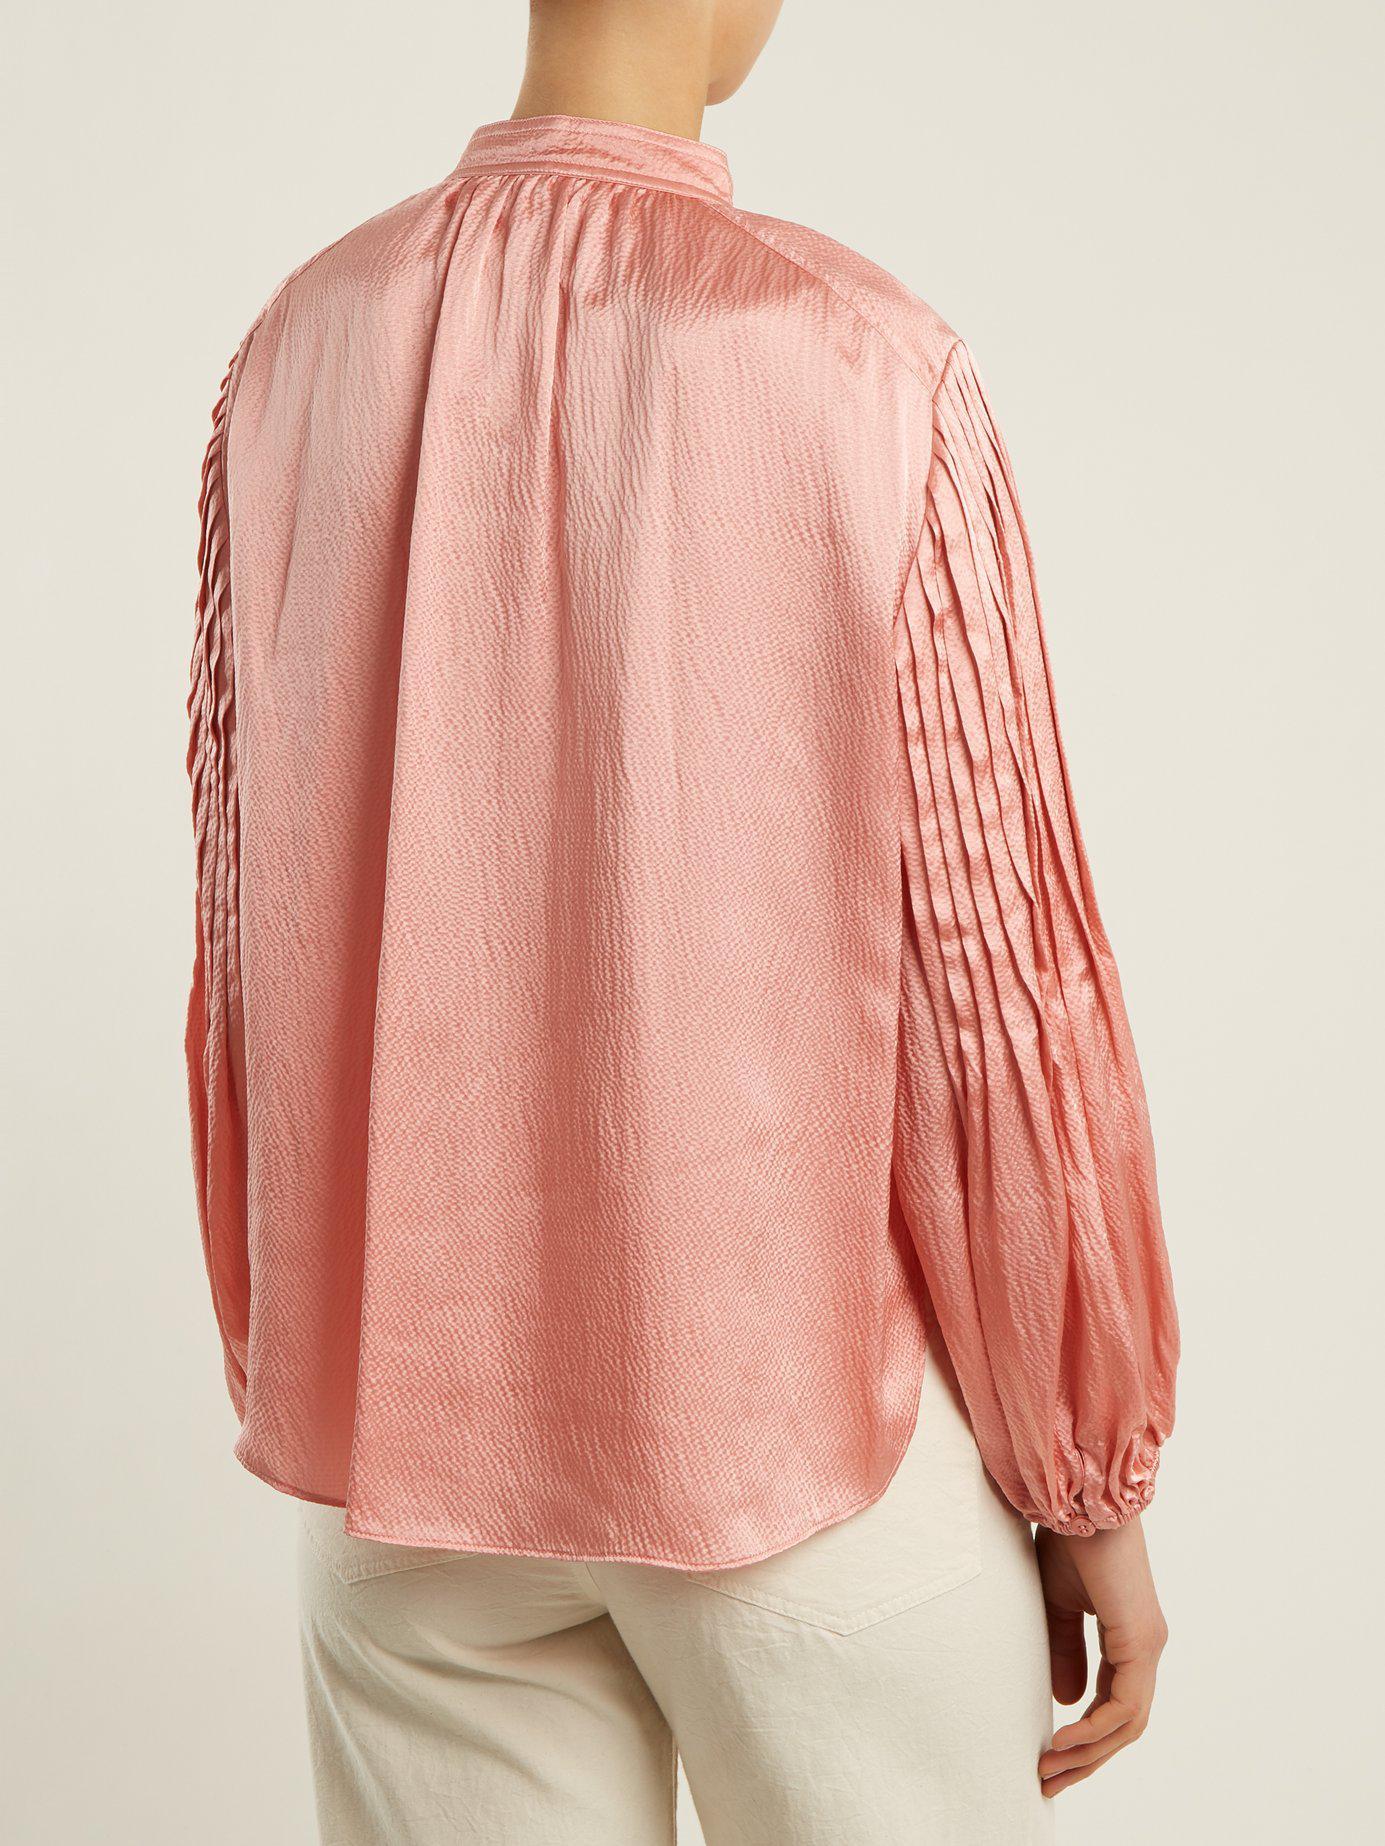 968f6ea0b8777c Apiece Apart Bravo Hammered-silk Top in Pink - Lyst